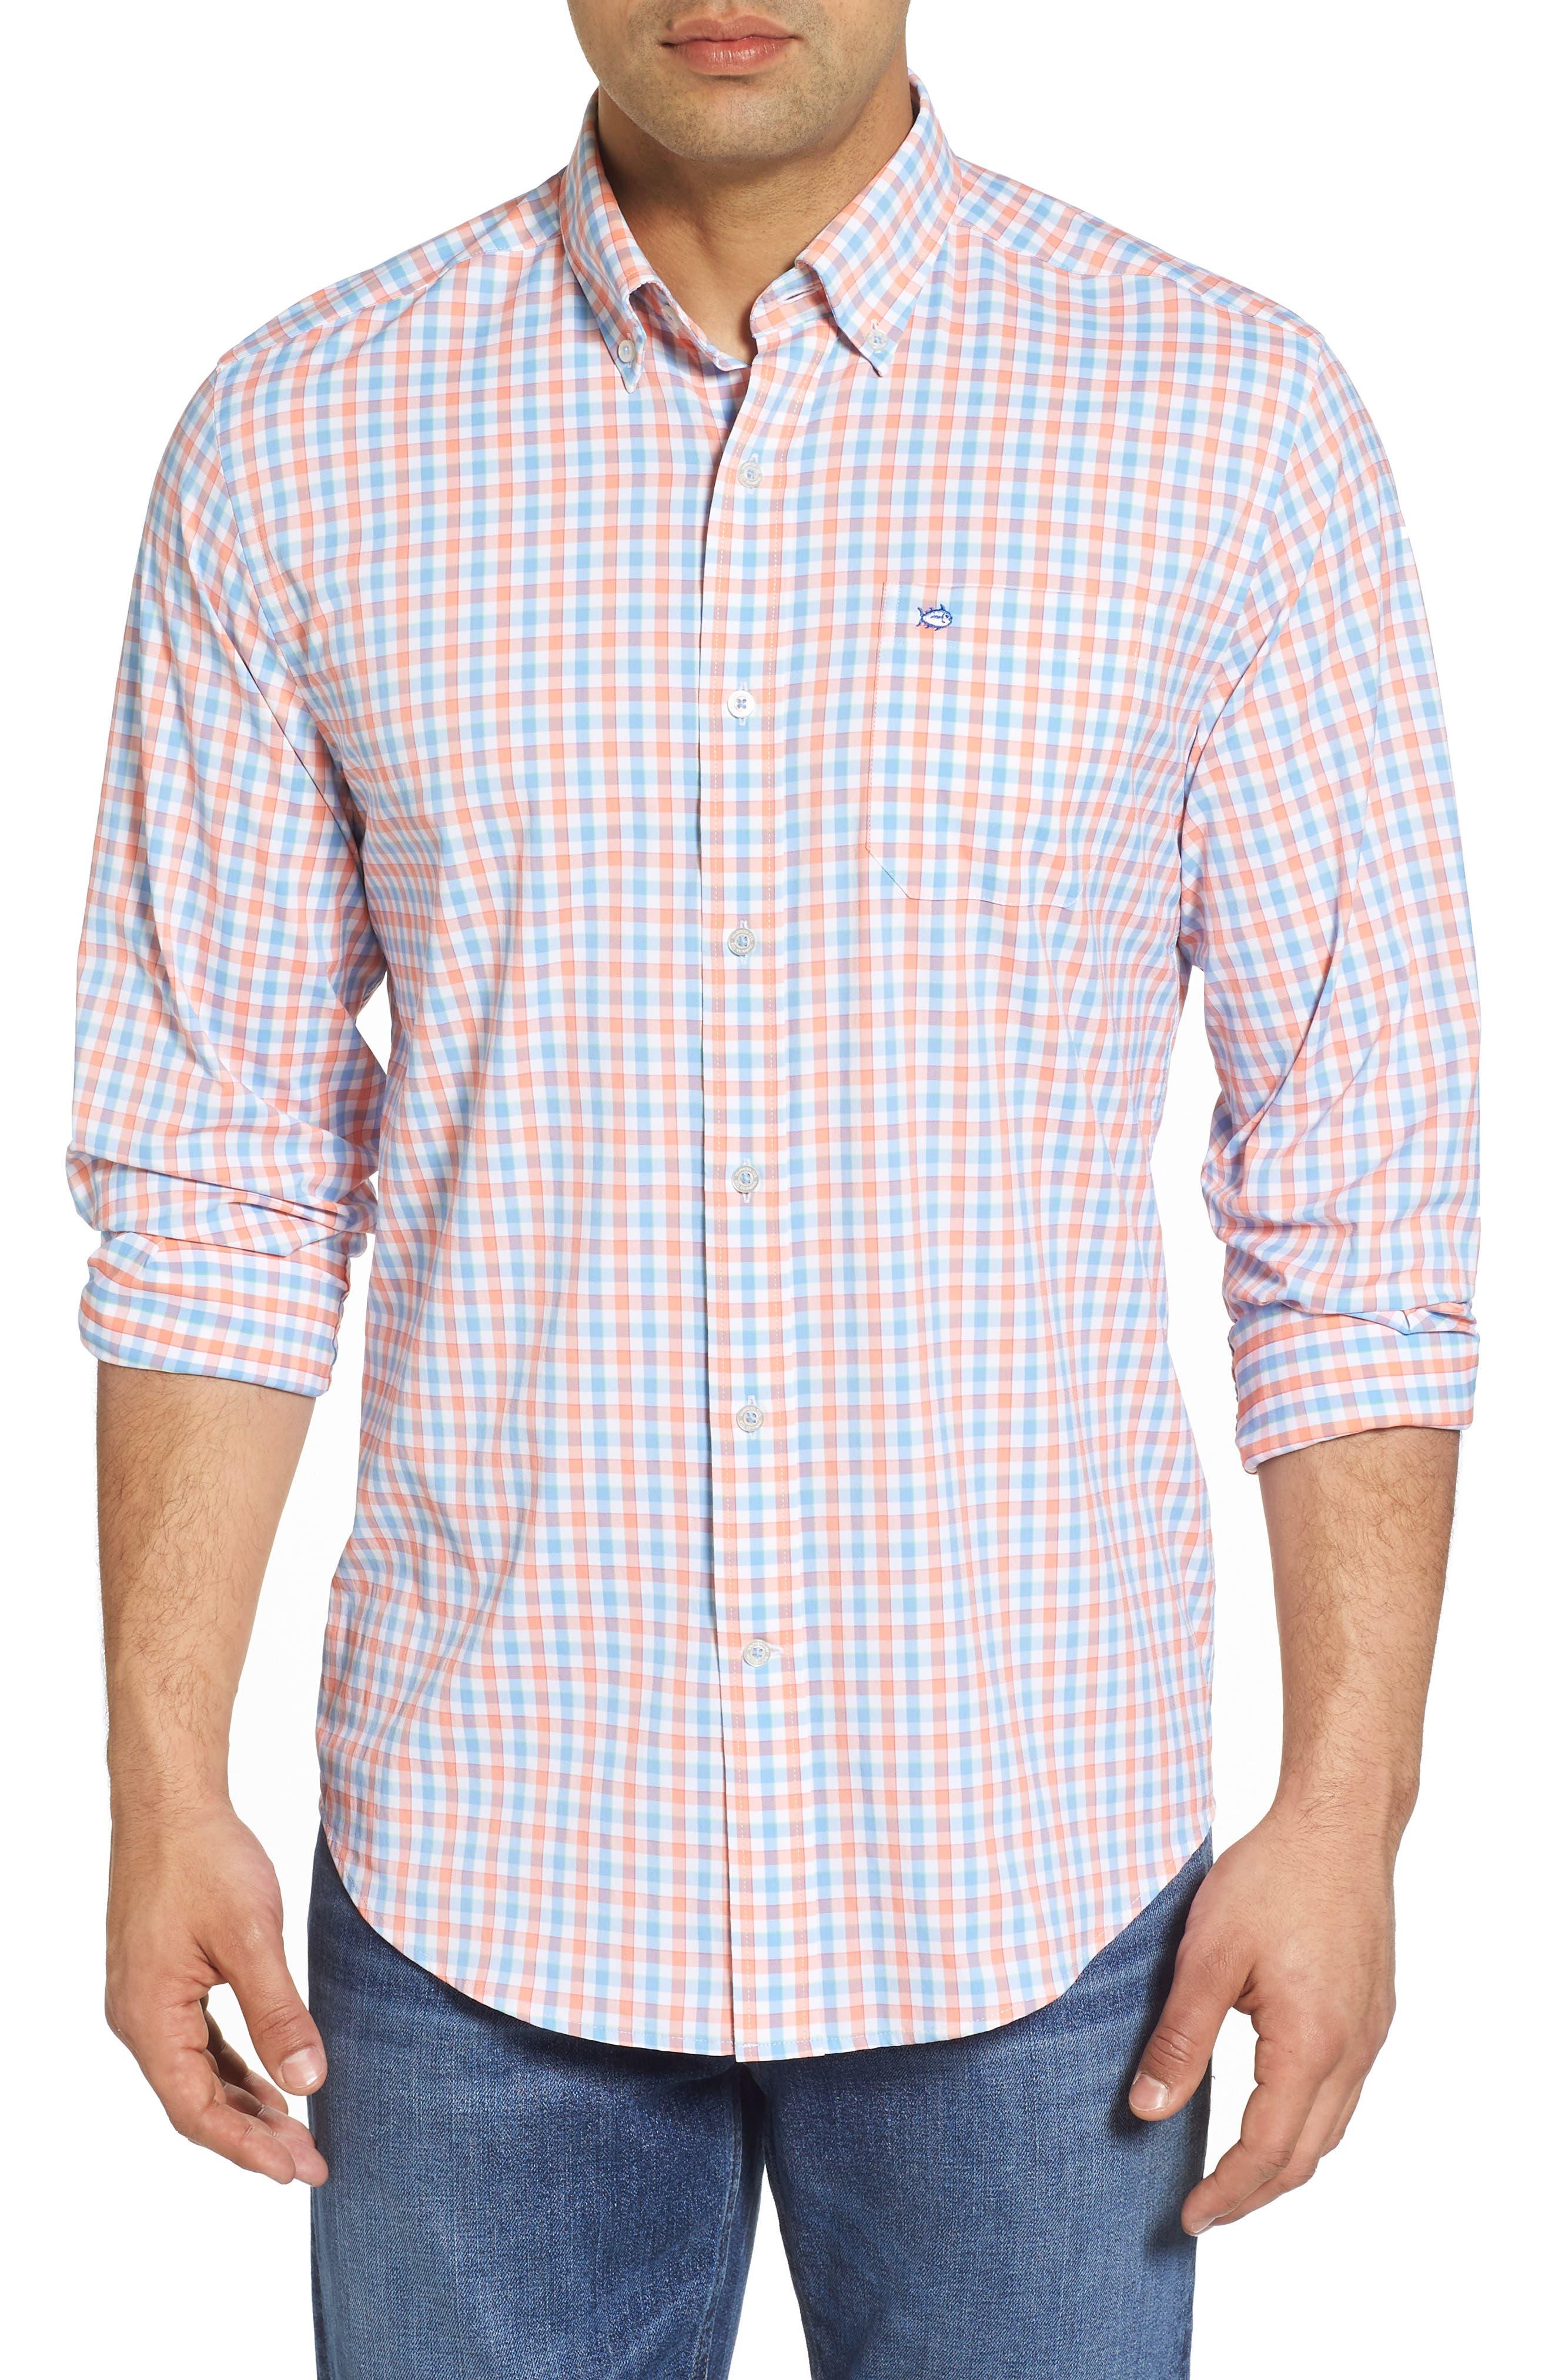 Market Square Regular Fit Stretch Check Sport Shirt,                             Main thumbnail 1, color,                             801